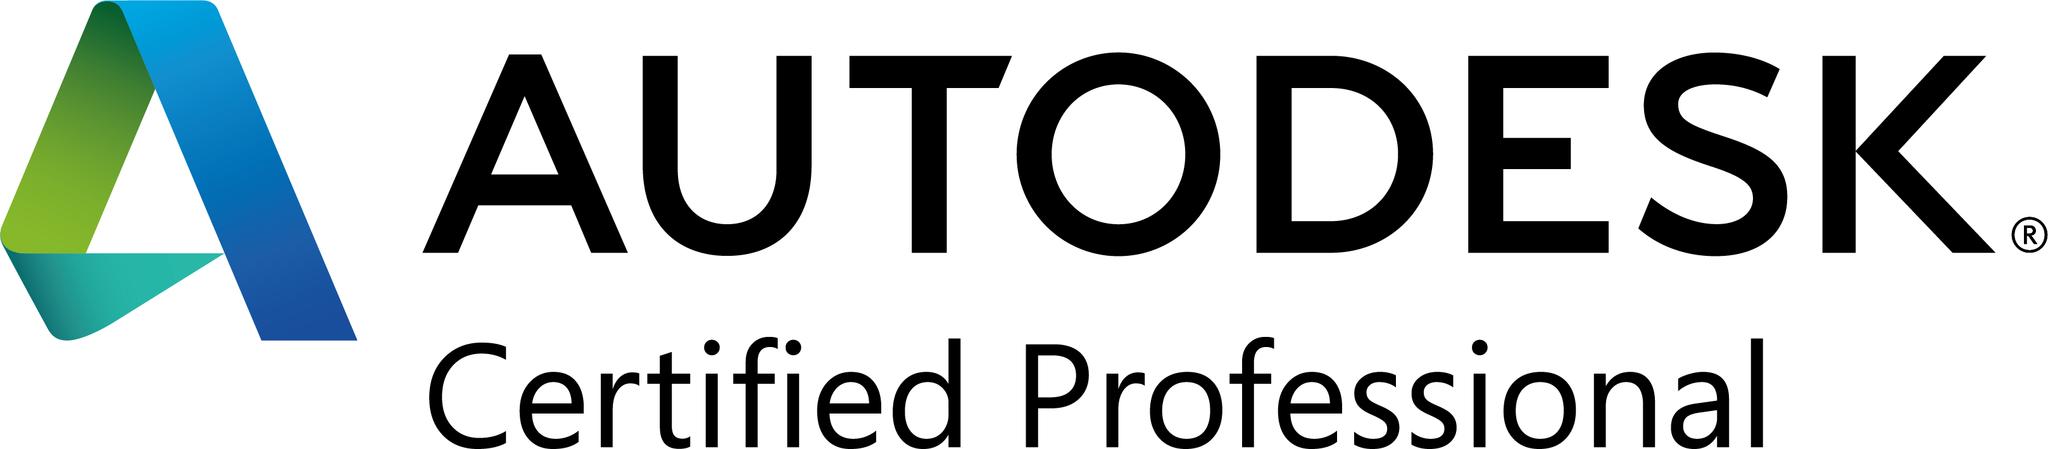 Autodesk_Certified_Professional_Logo_Color_blk